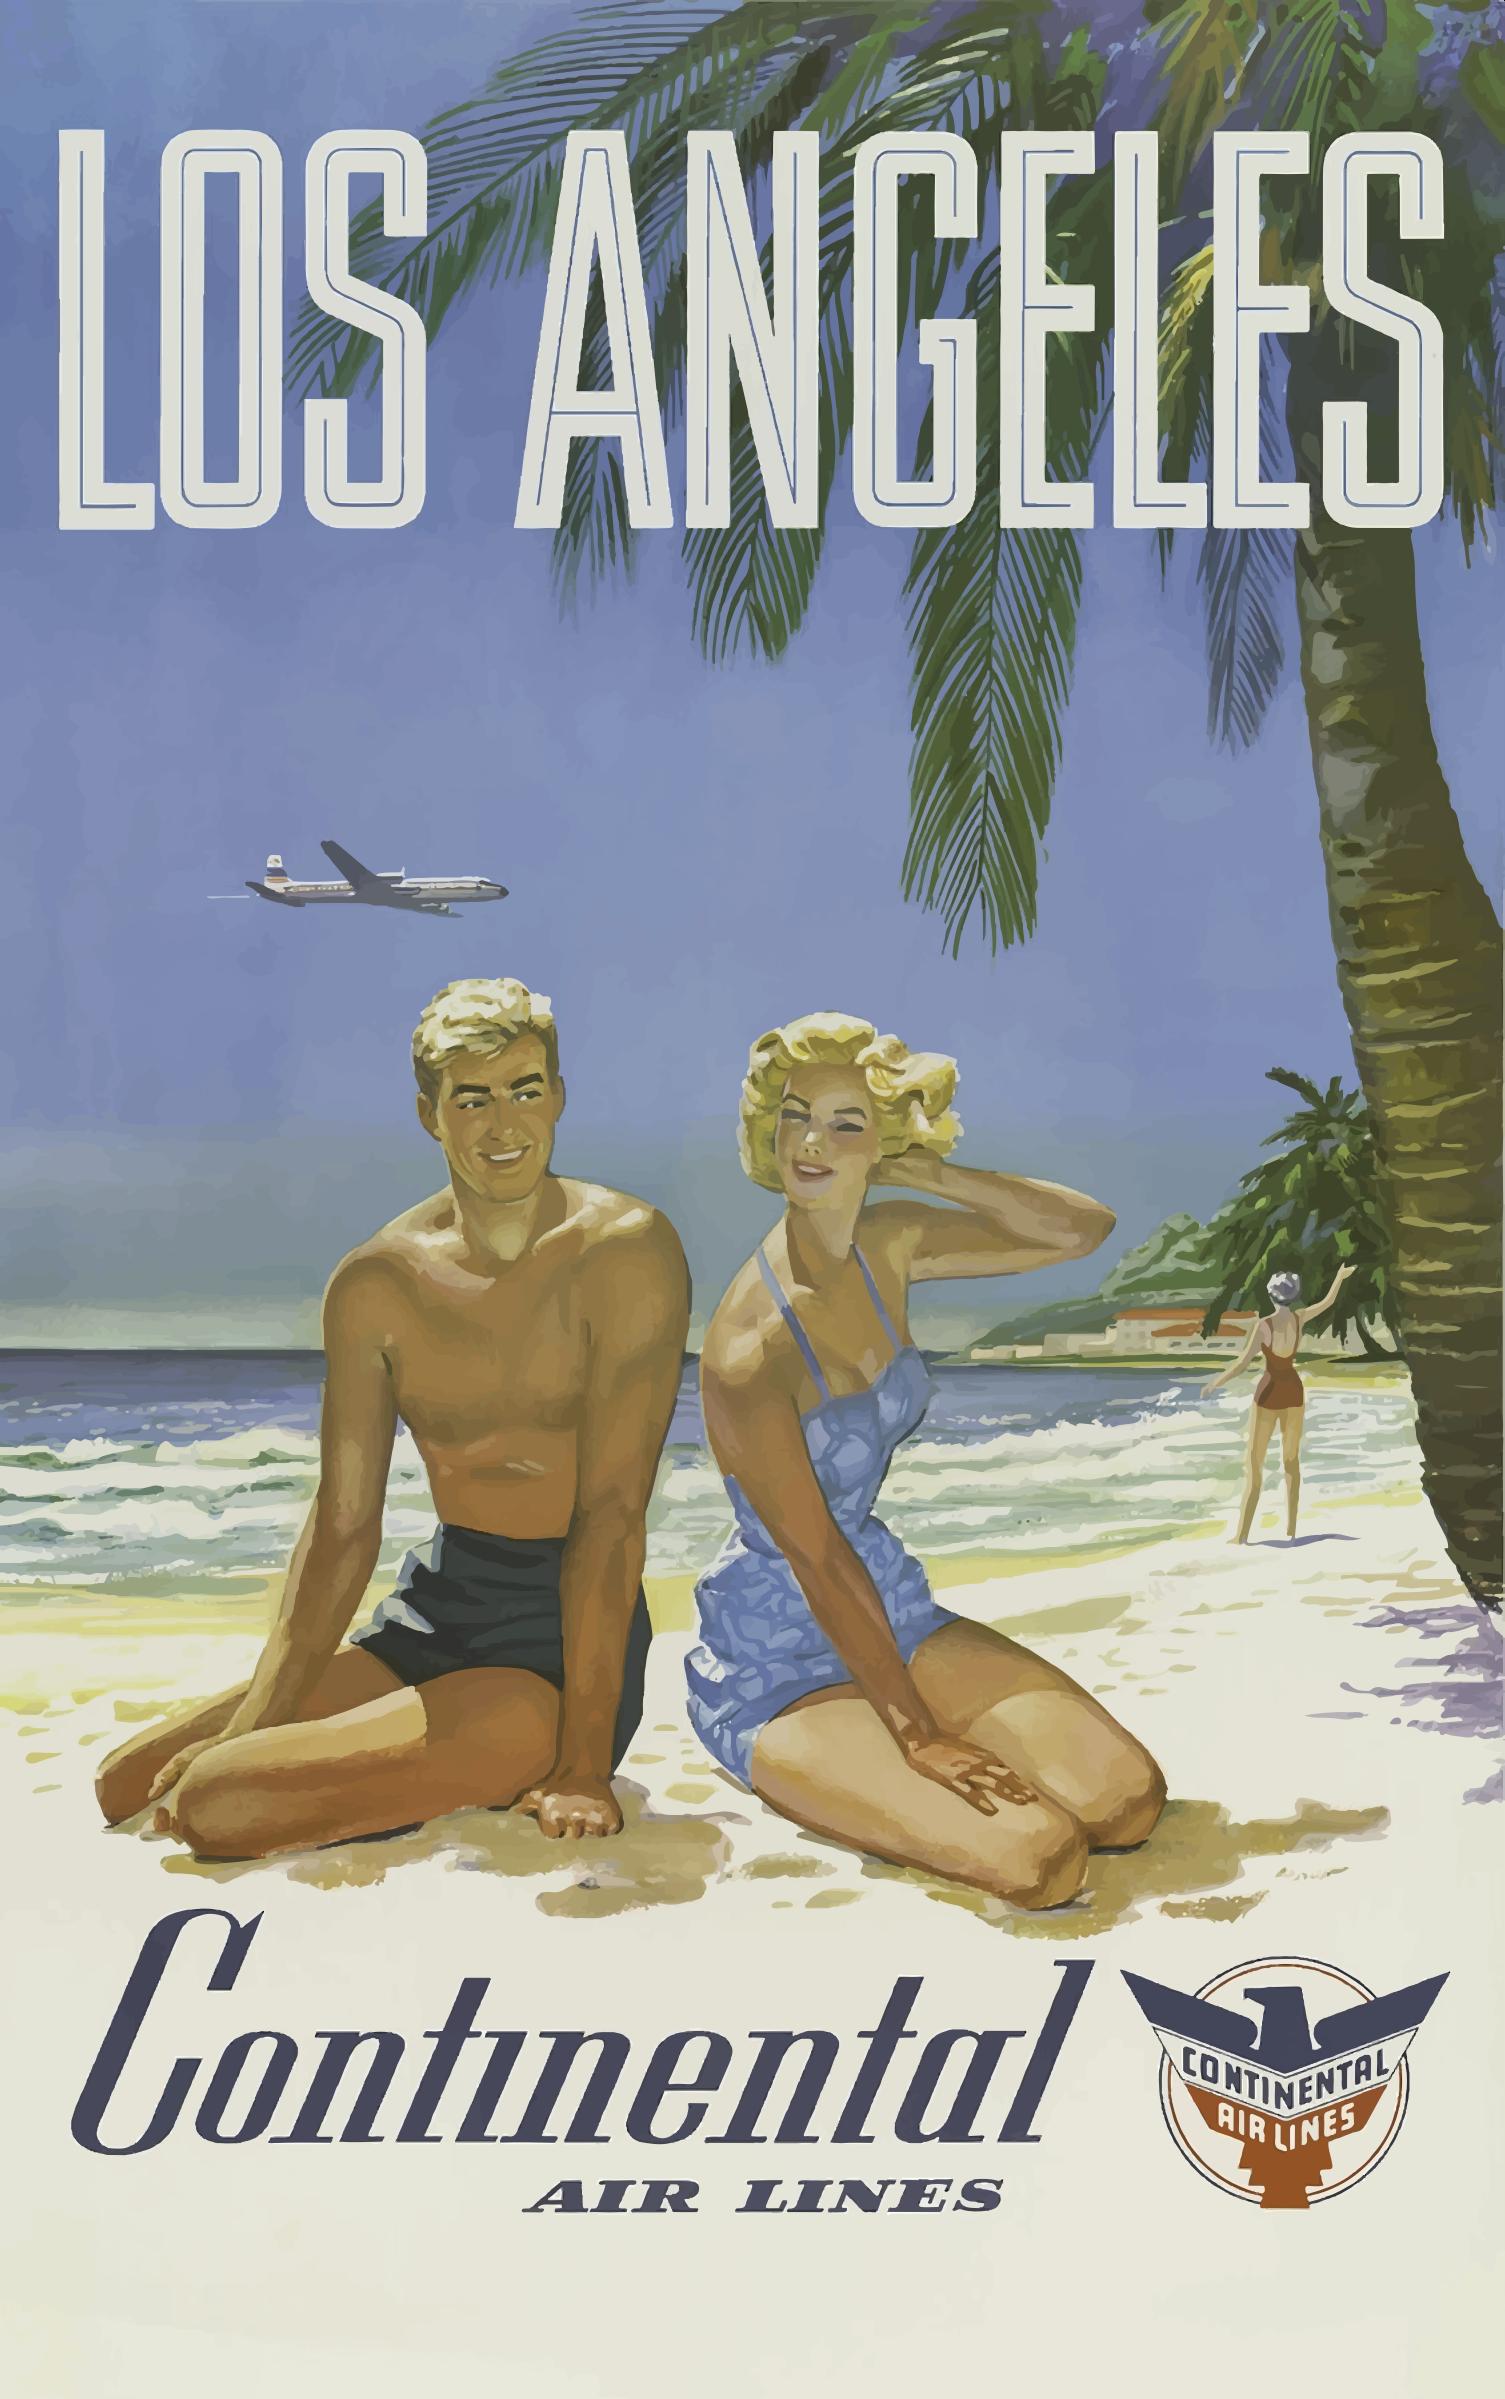 Clipart Vintage Travel Poster Los Angeles - Los angeles posters vintage